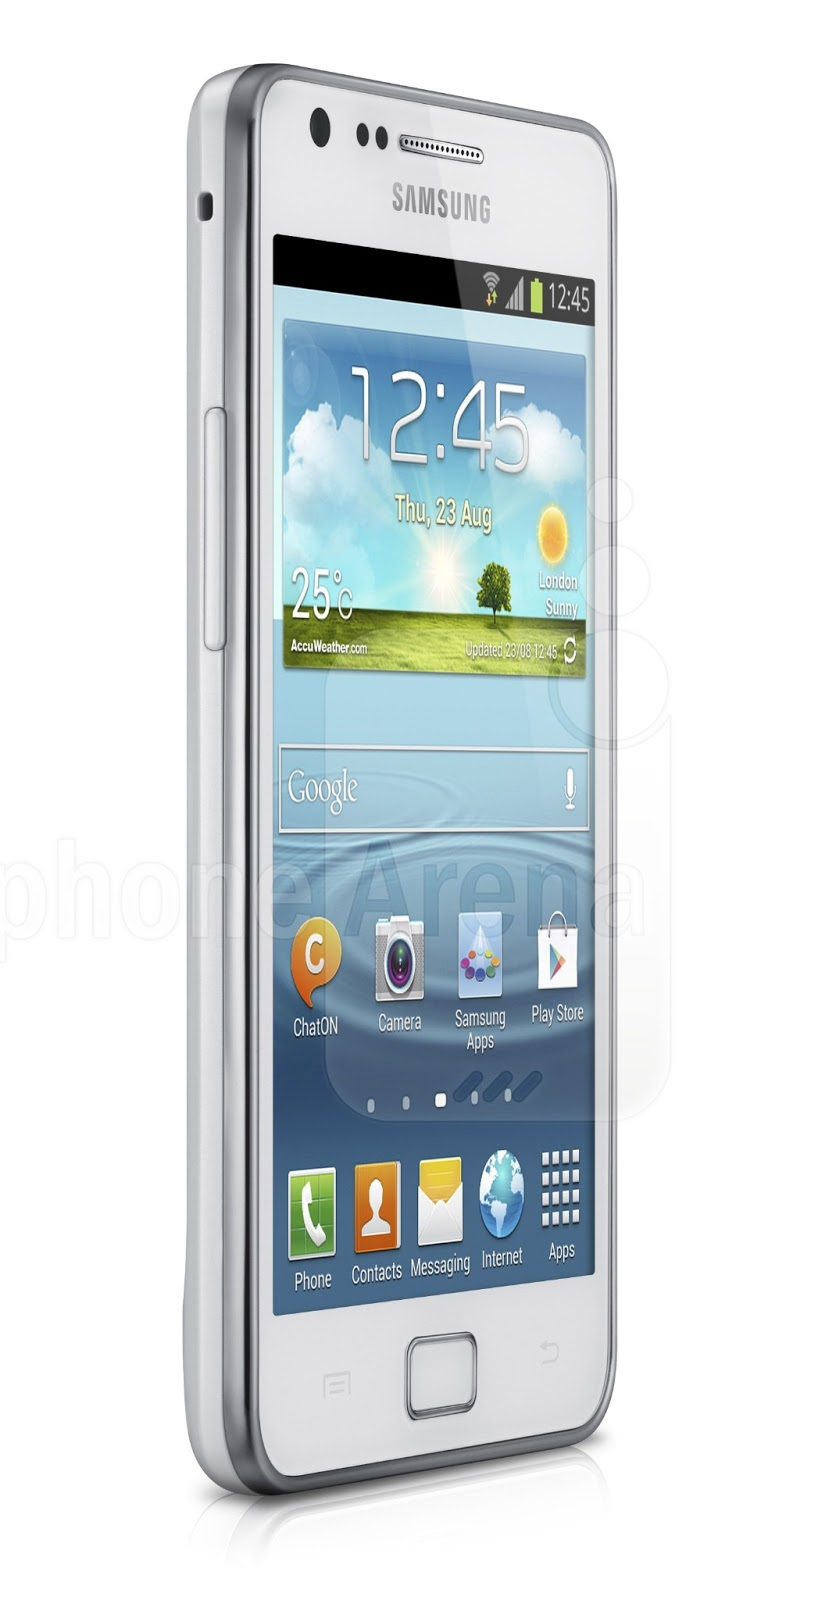 Samsung released new smartphone in Taiwan   GadgetCongress